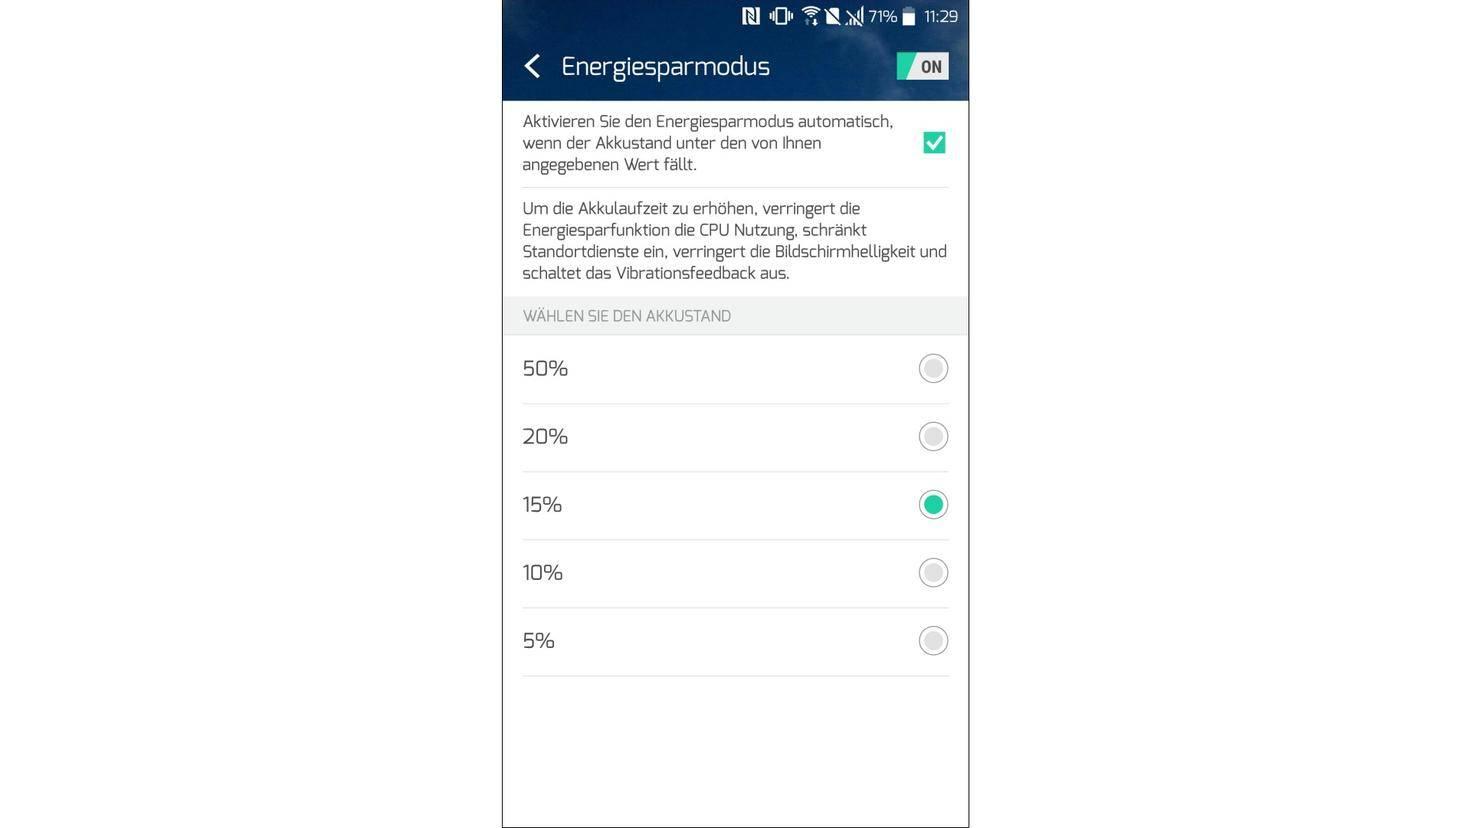 HTC U Play Energiesparmodus